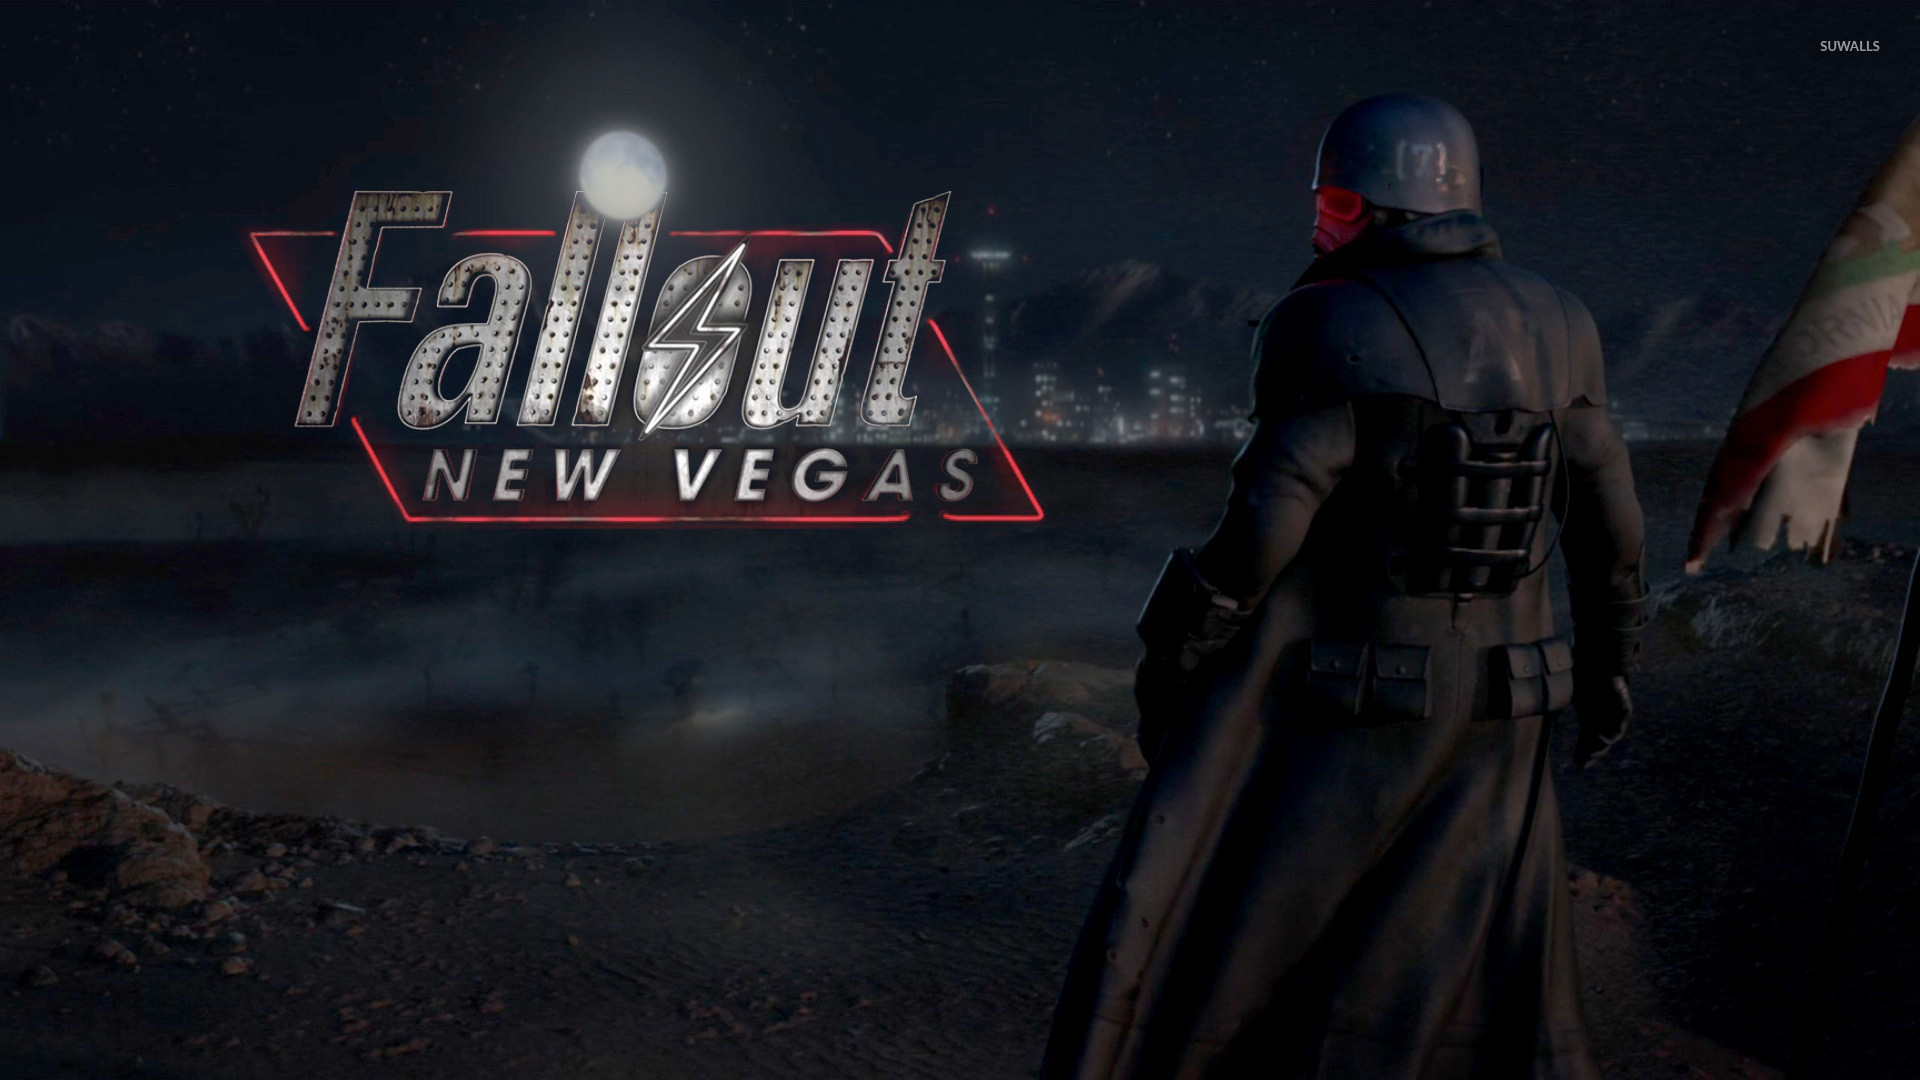 Fallout: New Vegas [3] wallpaper